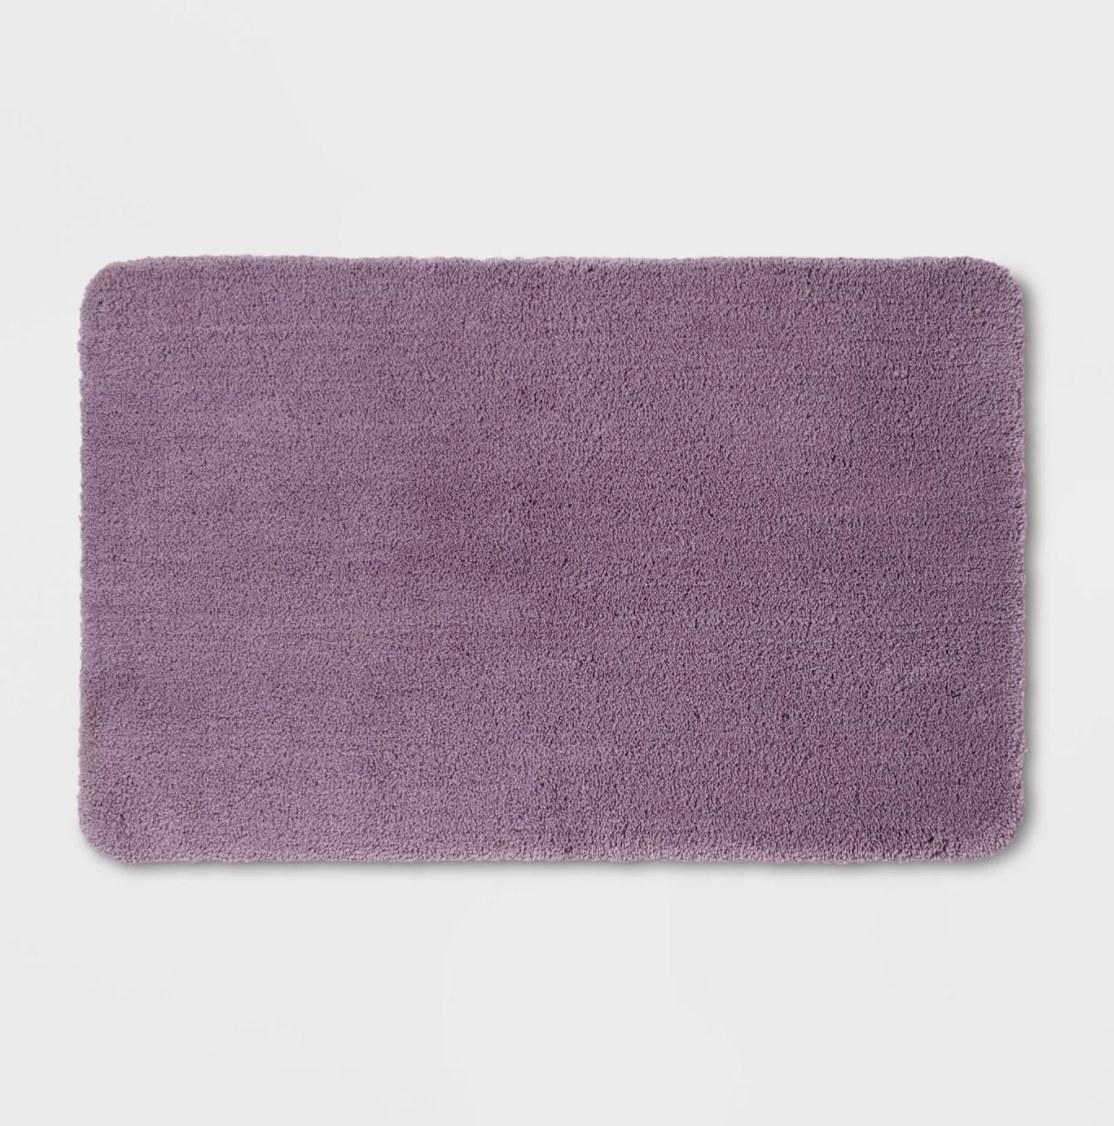 a purple plush bath mat